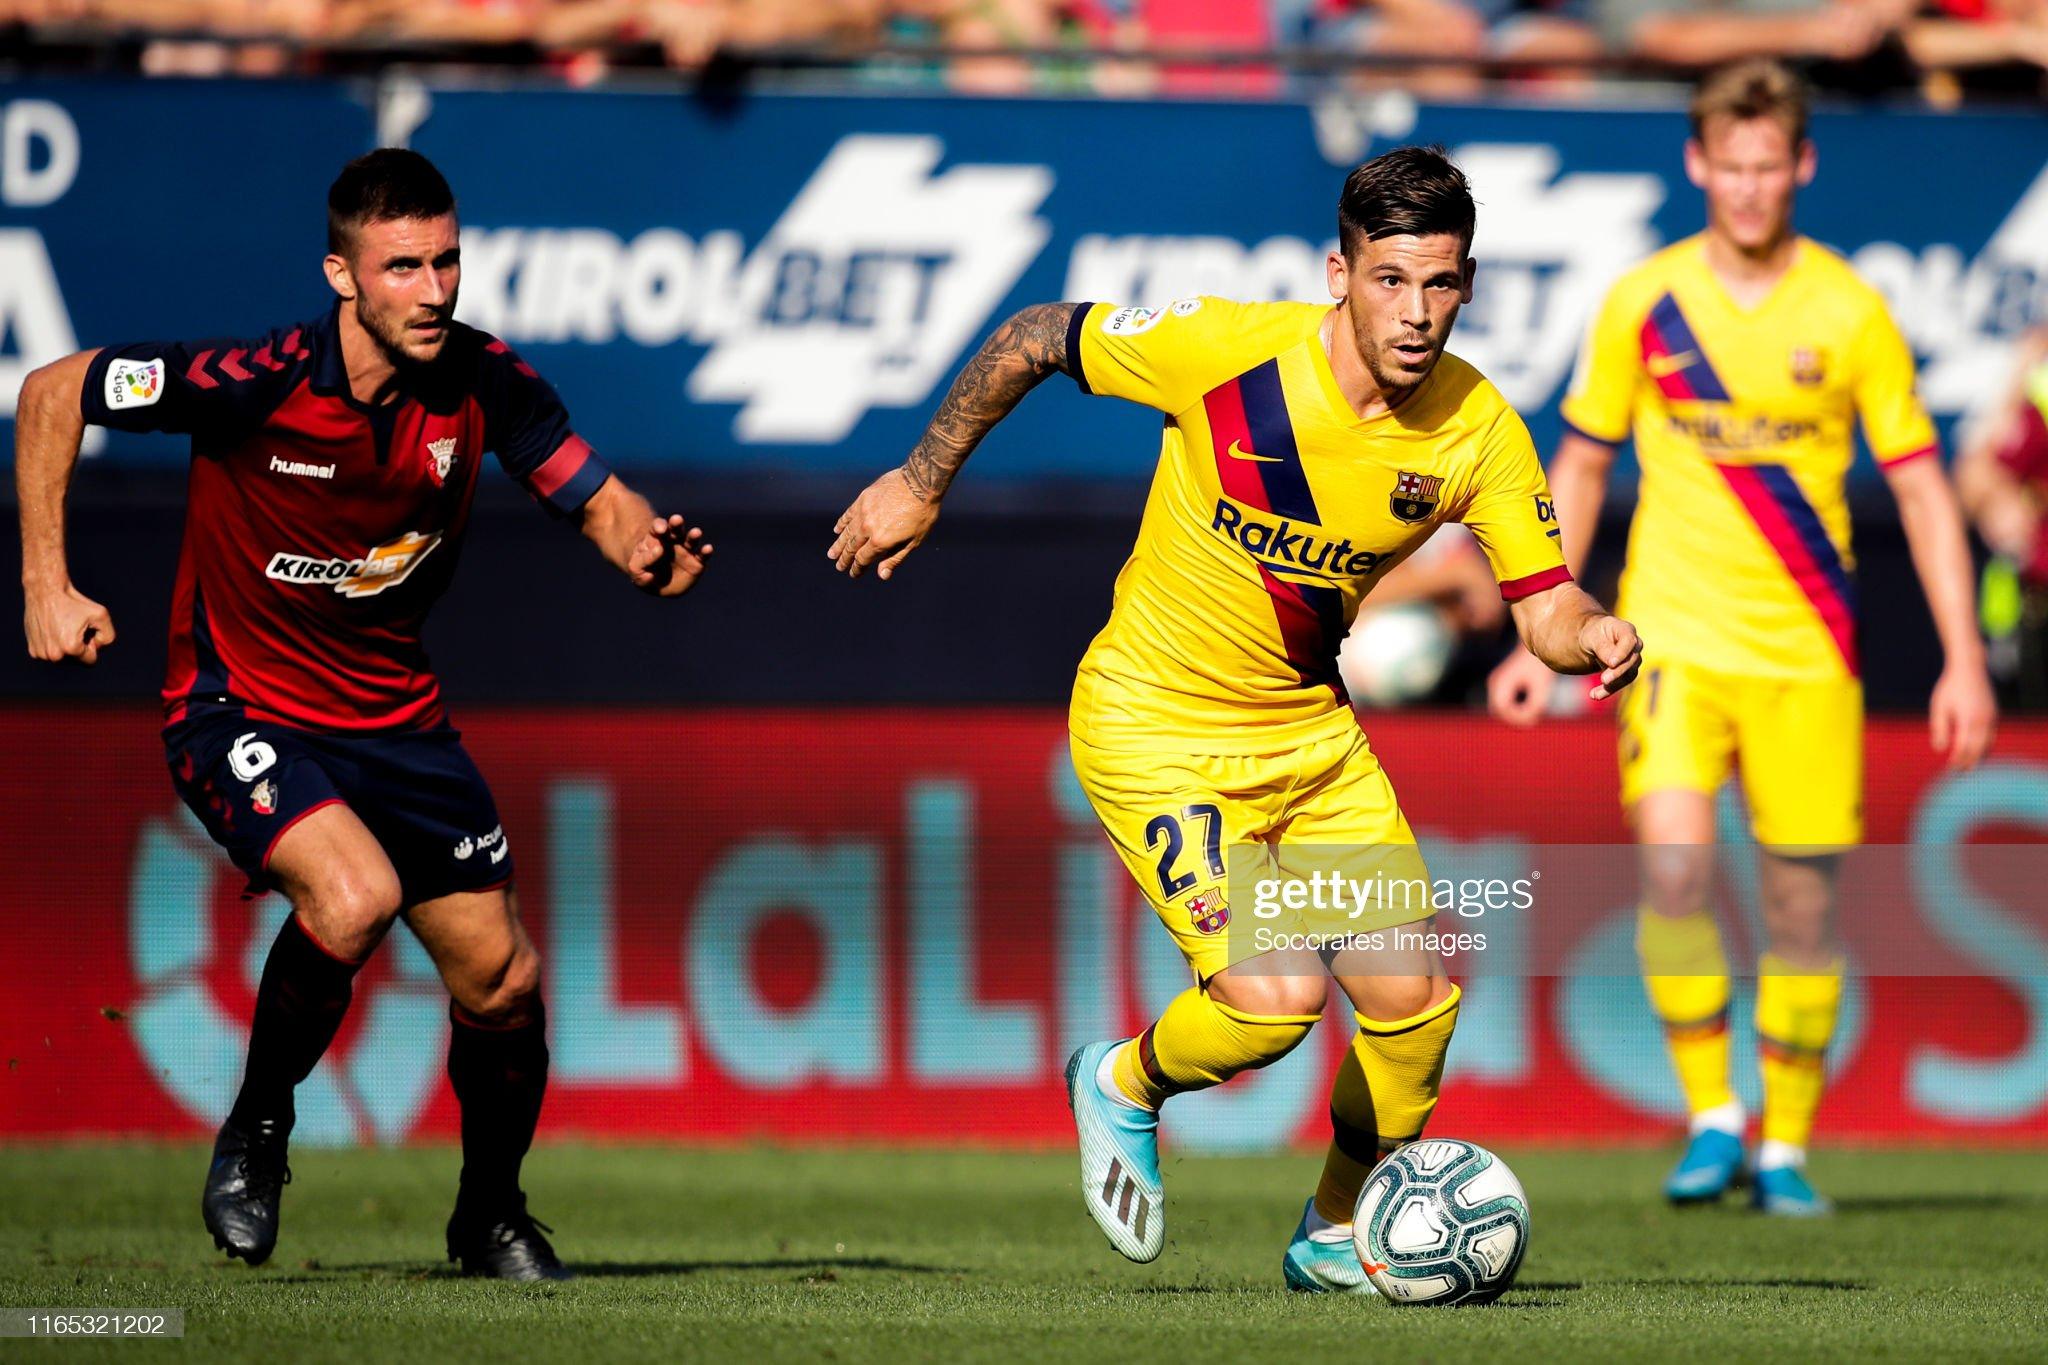 صور مباراة : أوساسونا - برشلونة 2-2 ( 31-08-2019 )  Carles-perez-of-fc-barcelona-during-the-la-liga-santander-match-v-picture-id1165321202?s=2048x2048